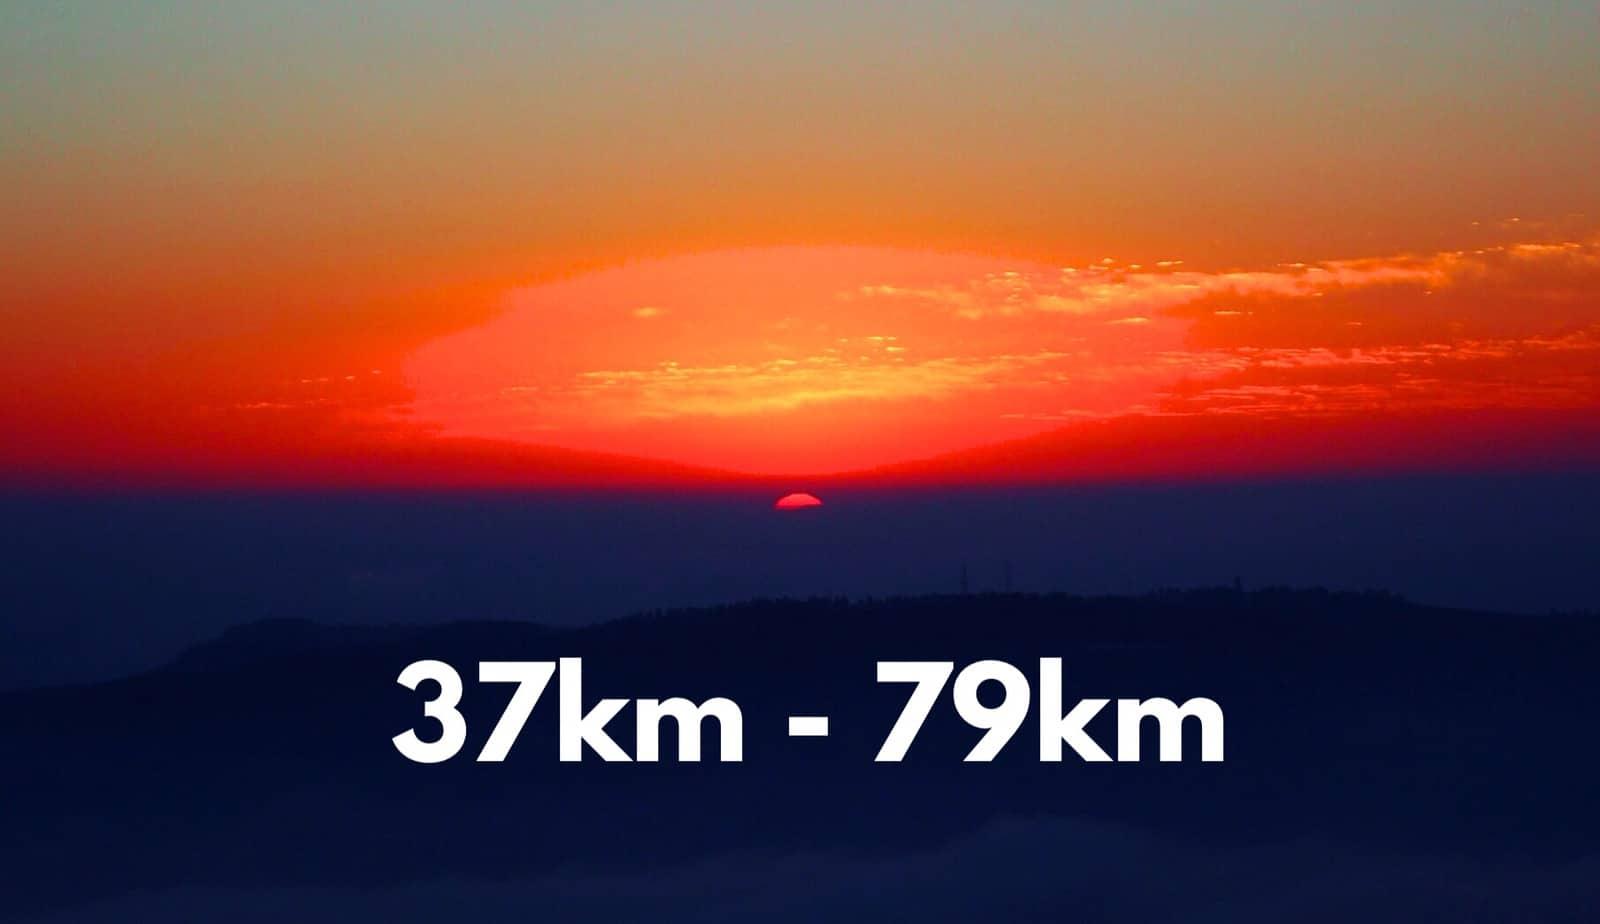 37-79km